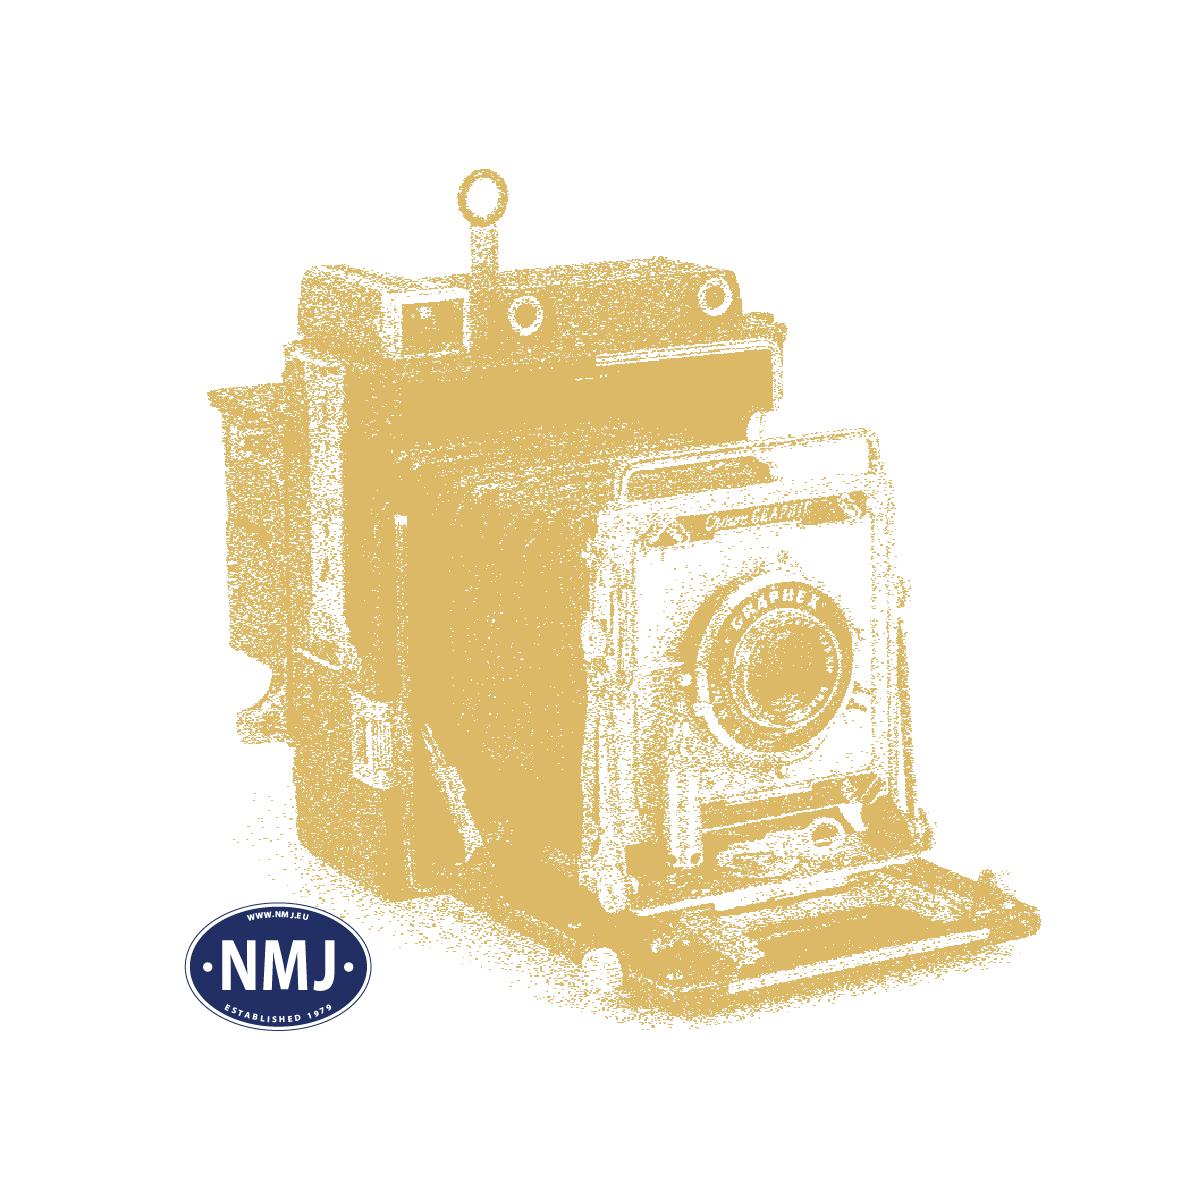 MBR55-1005 - Gressmatte #5, 30 x 40 Cm